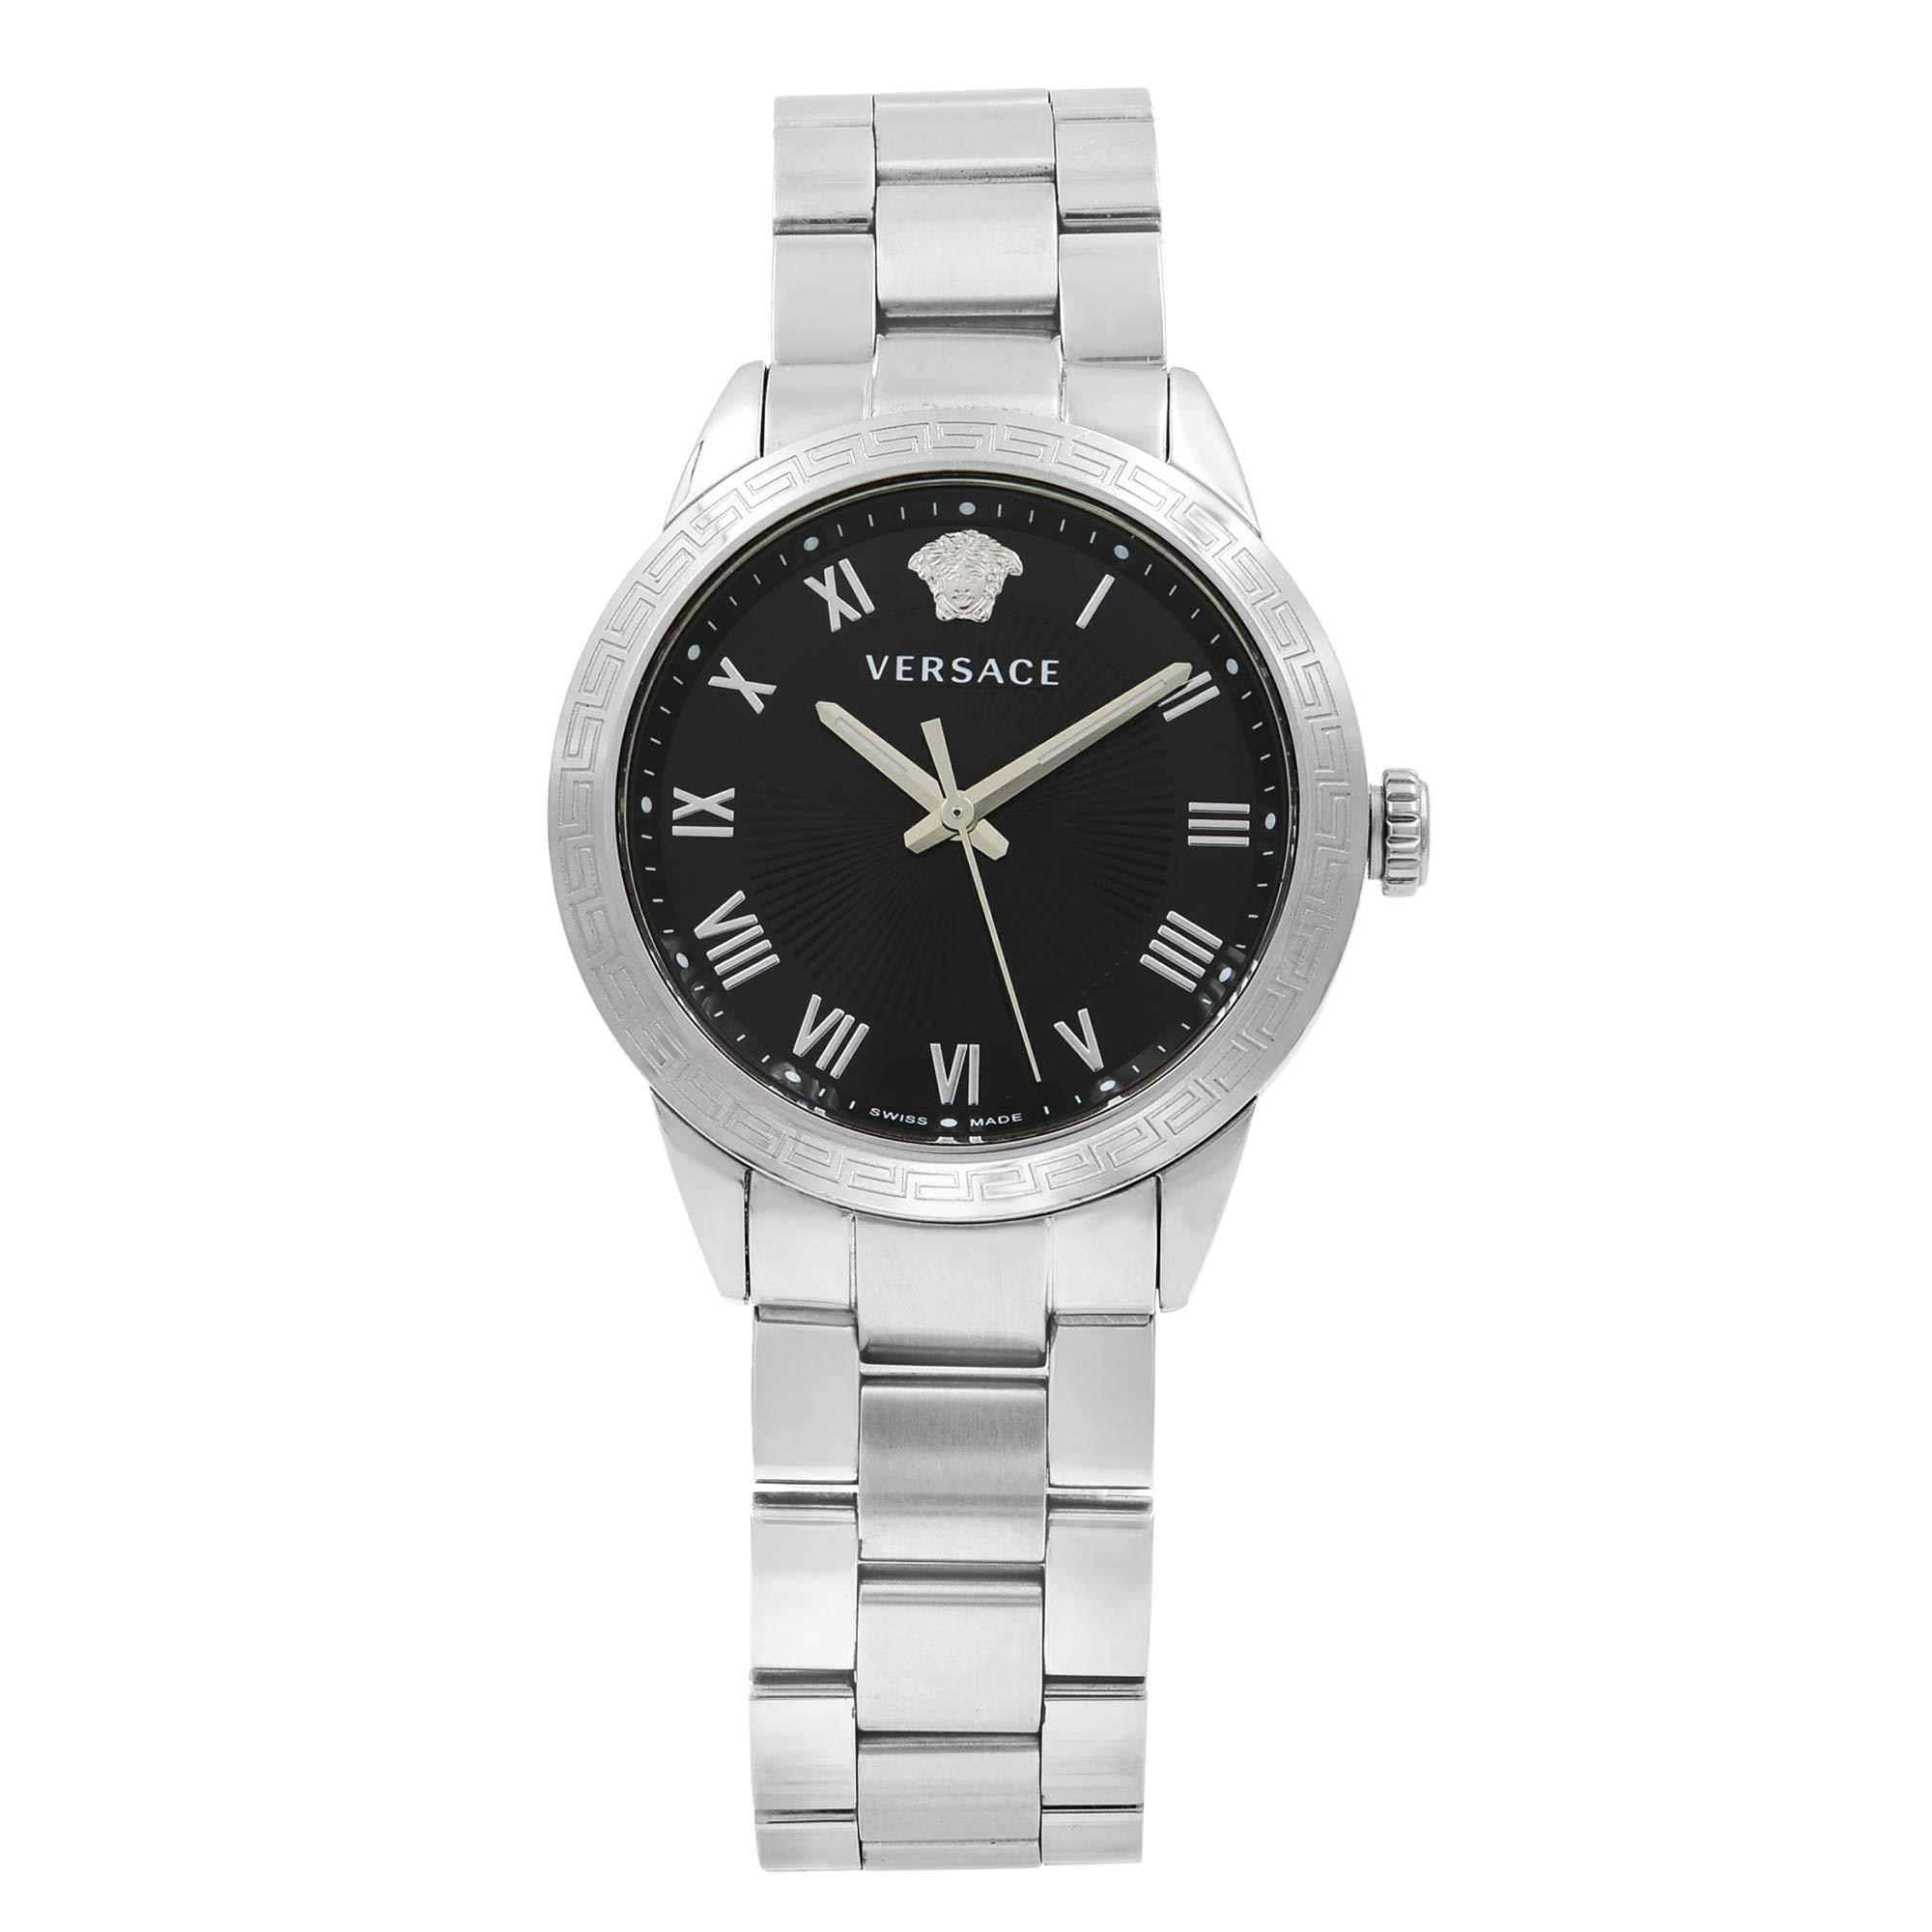 Versace V-Sport Quartz Female Watch P6Q99FD008S099 (Certified Pre-Owned) by Versace